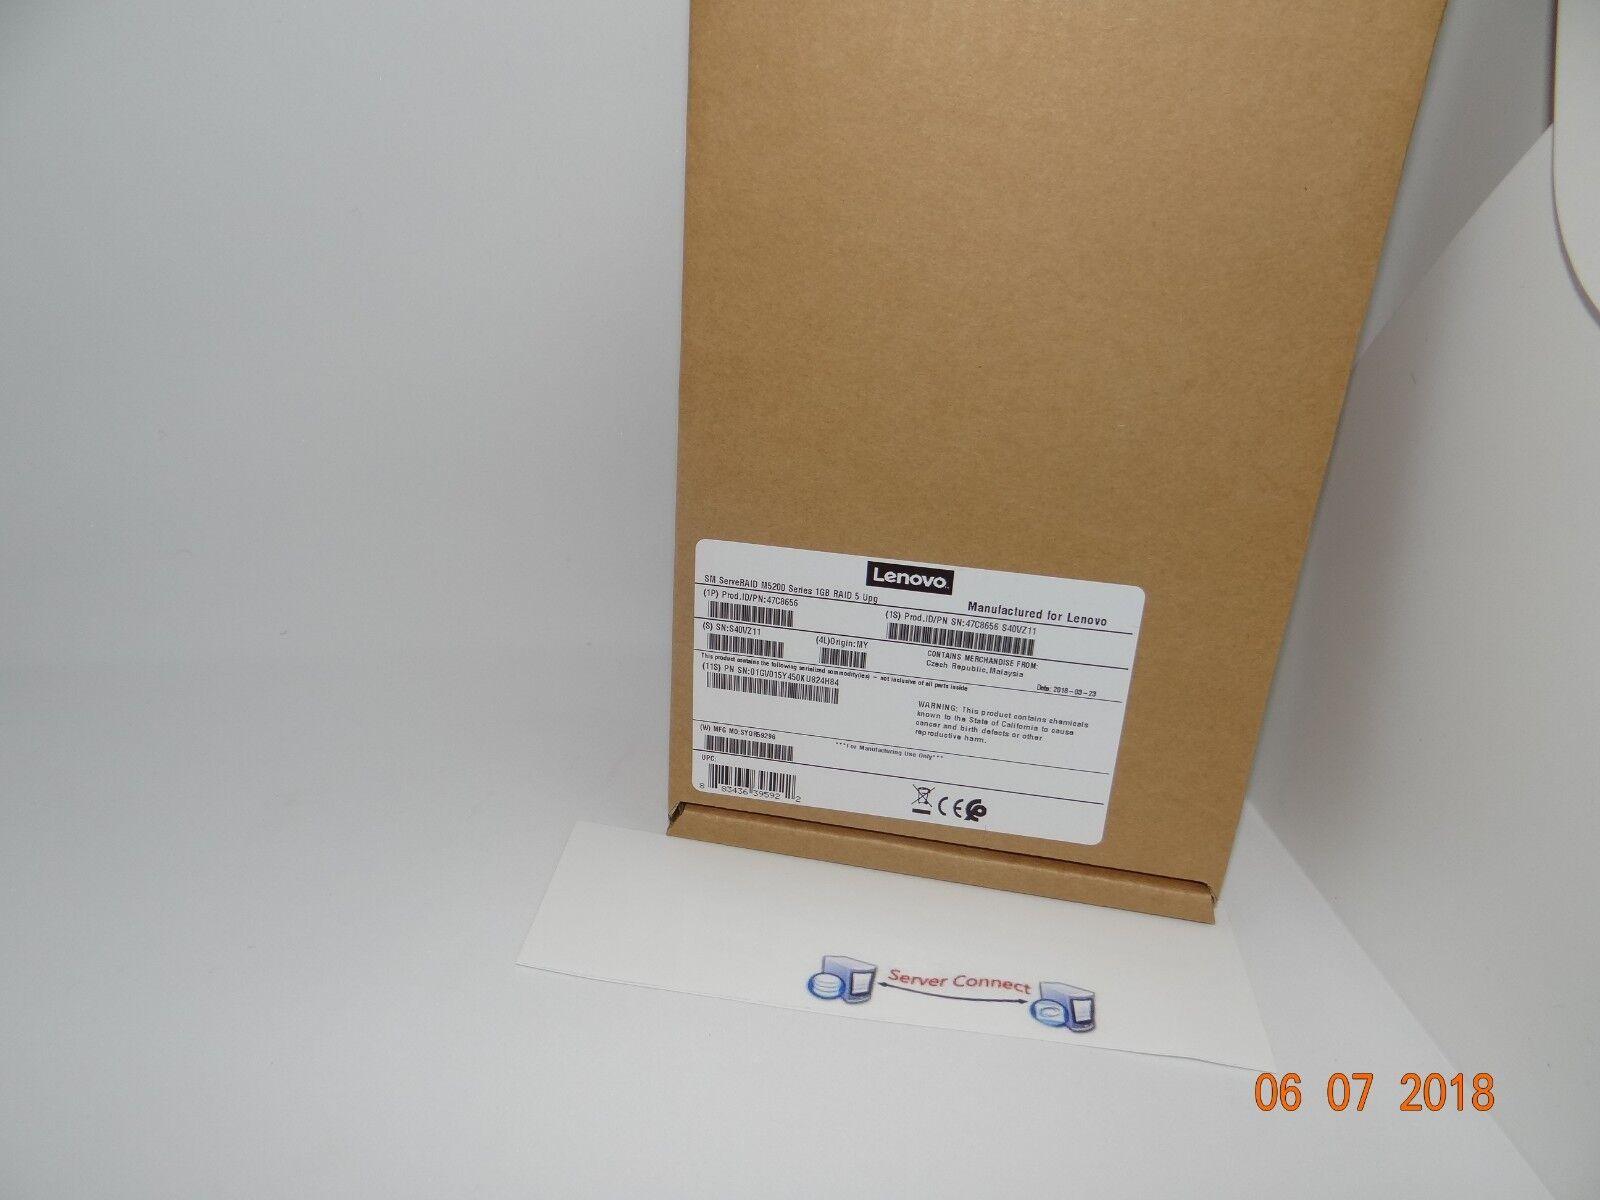 47C8656 IBM/Lenovo ServerRaid M5200 Series 1GB RAID 5 Upgrade Cache Card